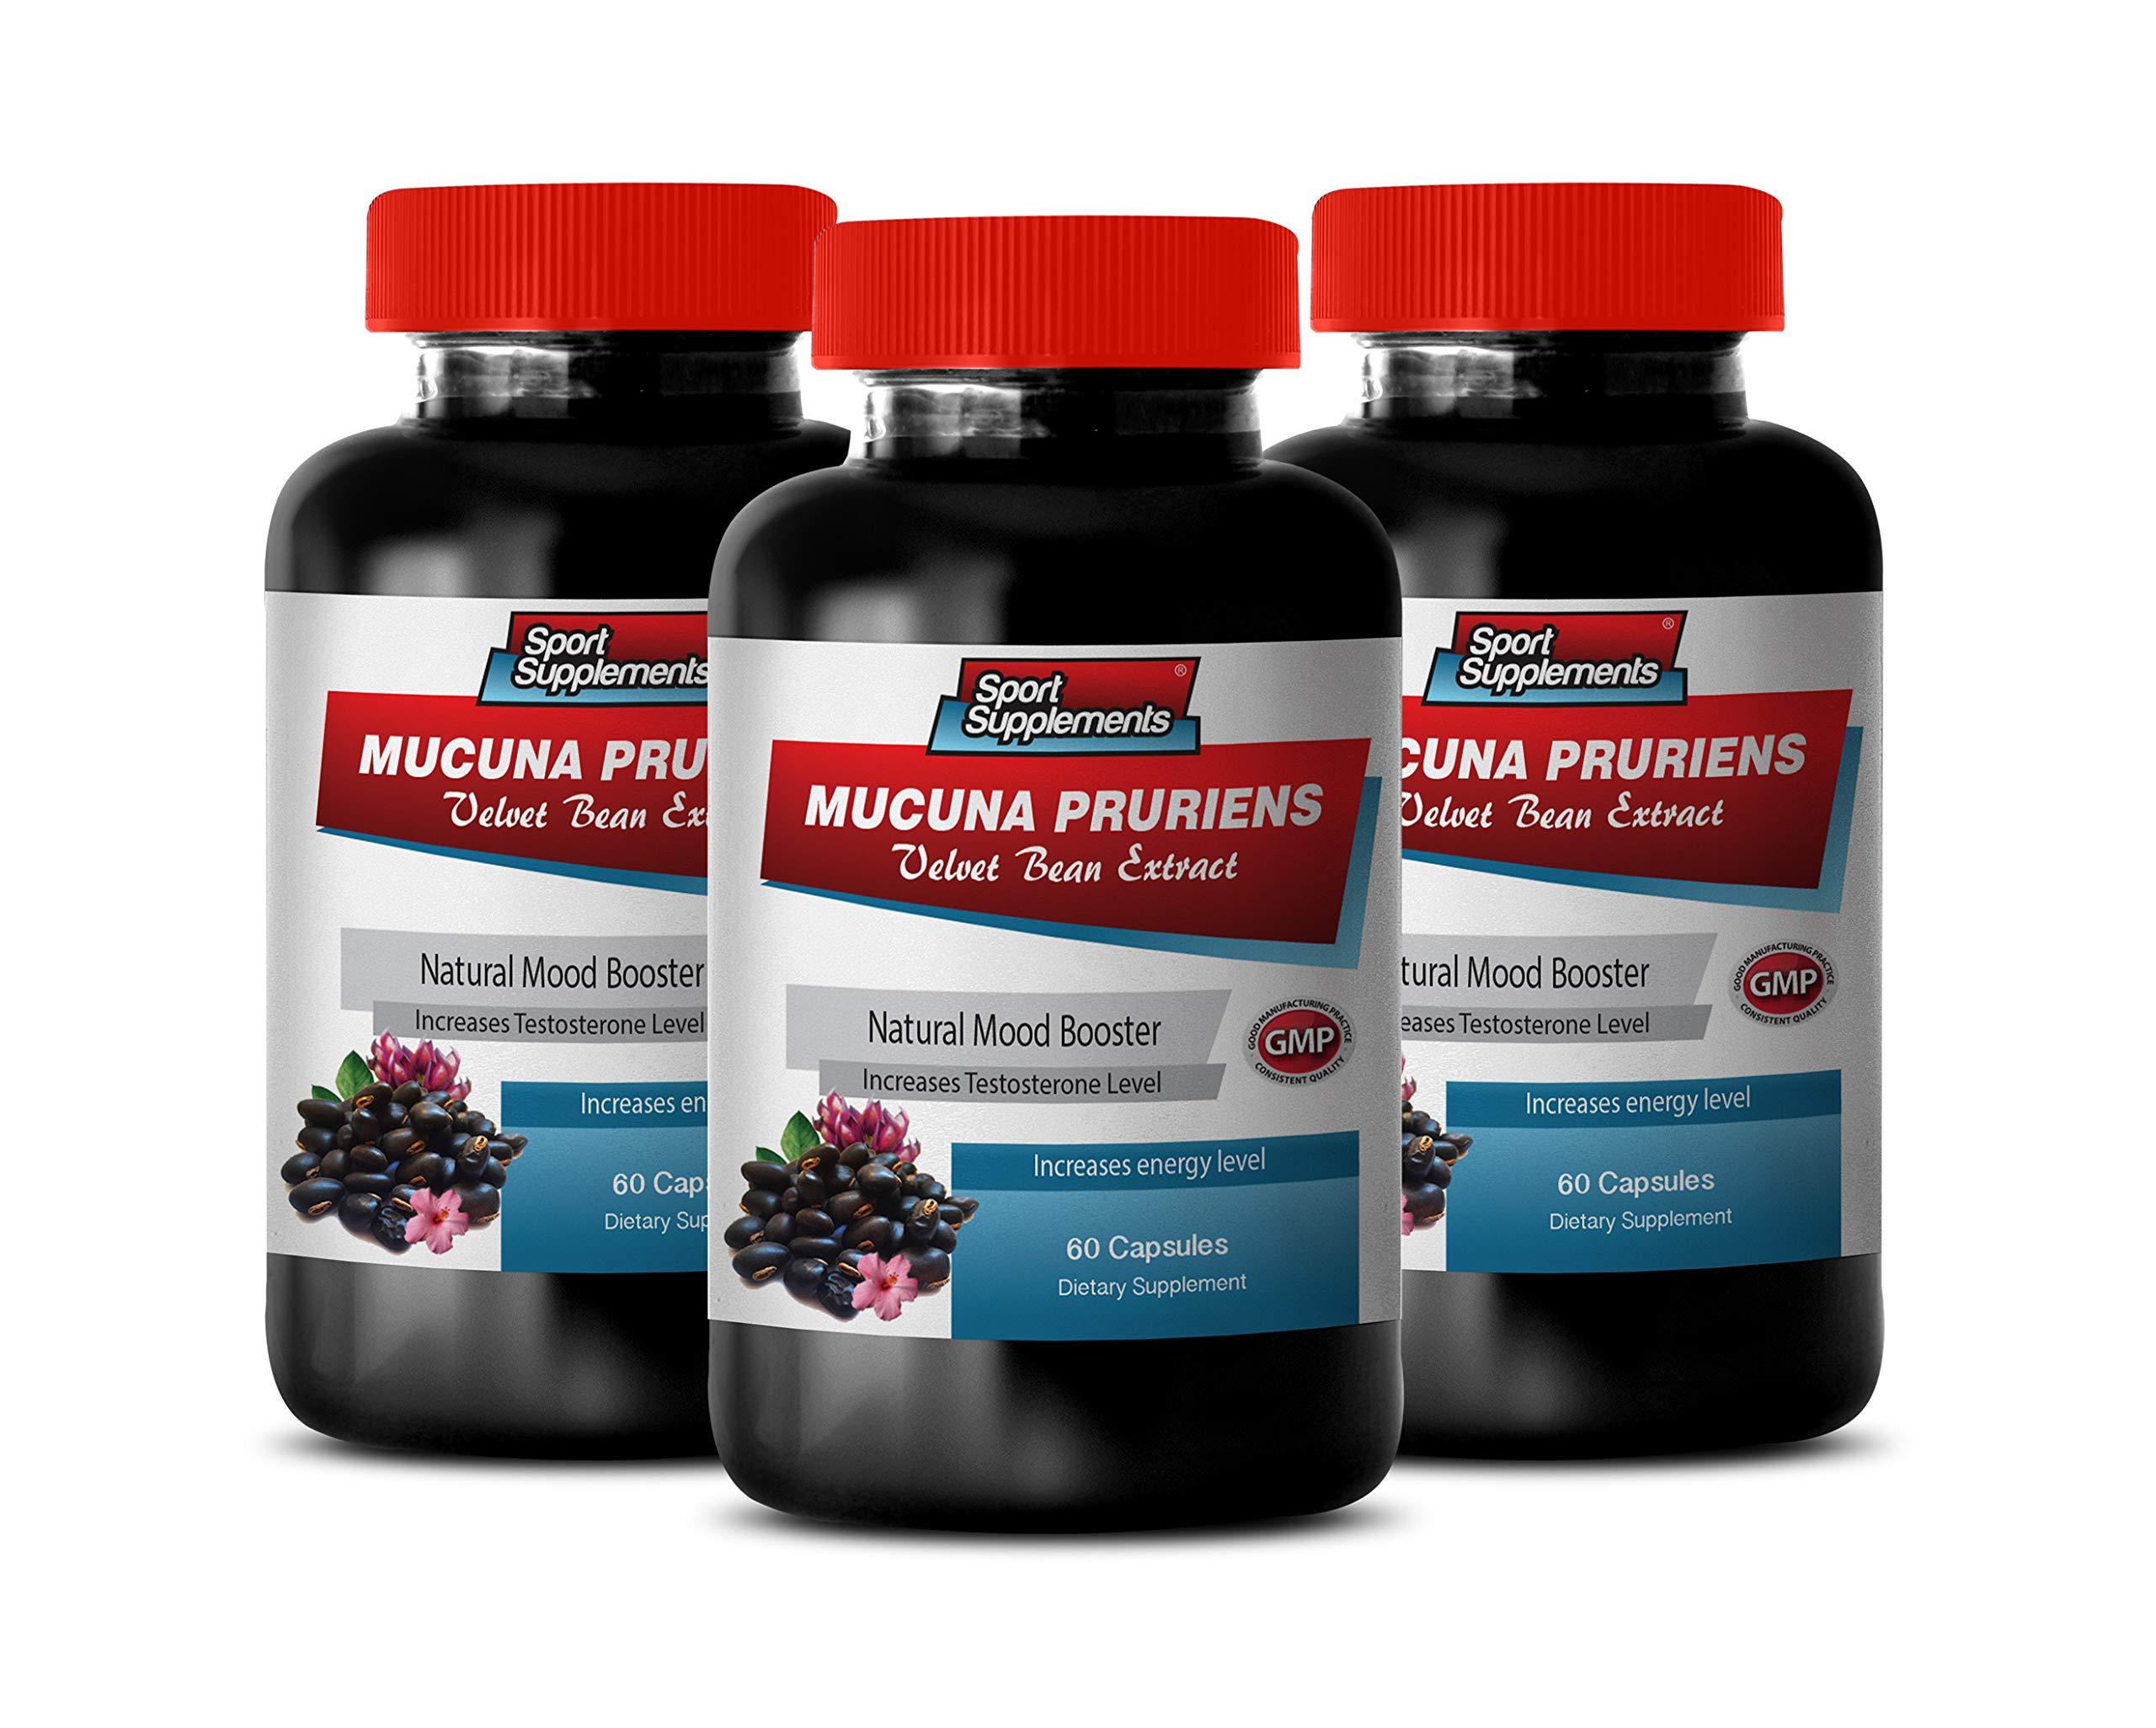 Stress Supplements for Women - MUCUNA PRURIENS Velvet Beans Extract - antioxidant Vitamins for Men - 3 Bottles 180 Capsules